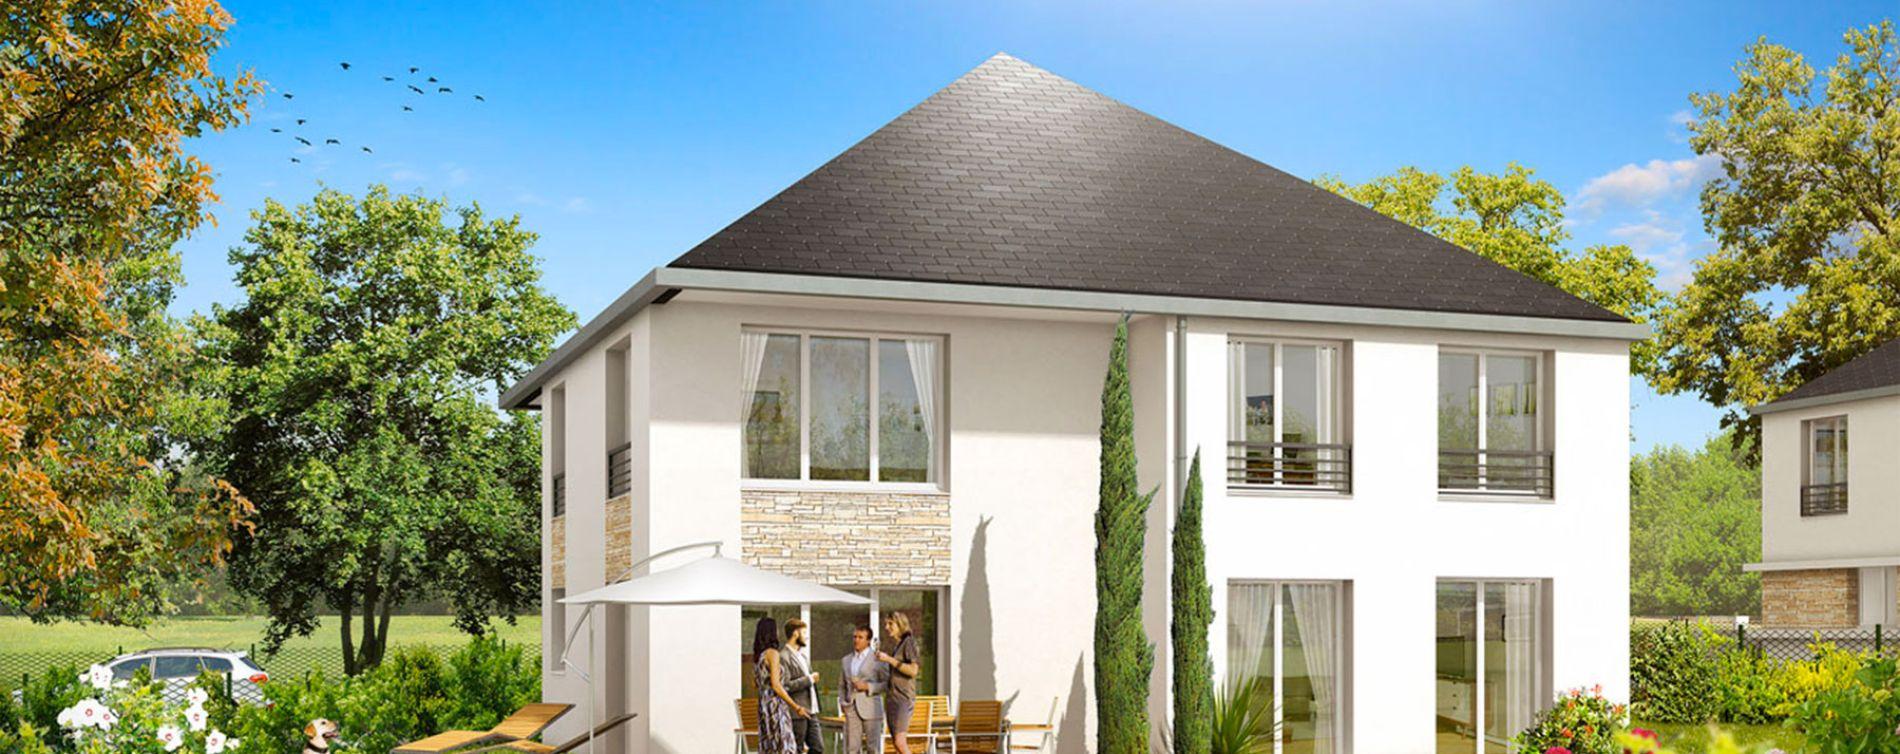 Résidence Villa Elisabeth à Draveil